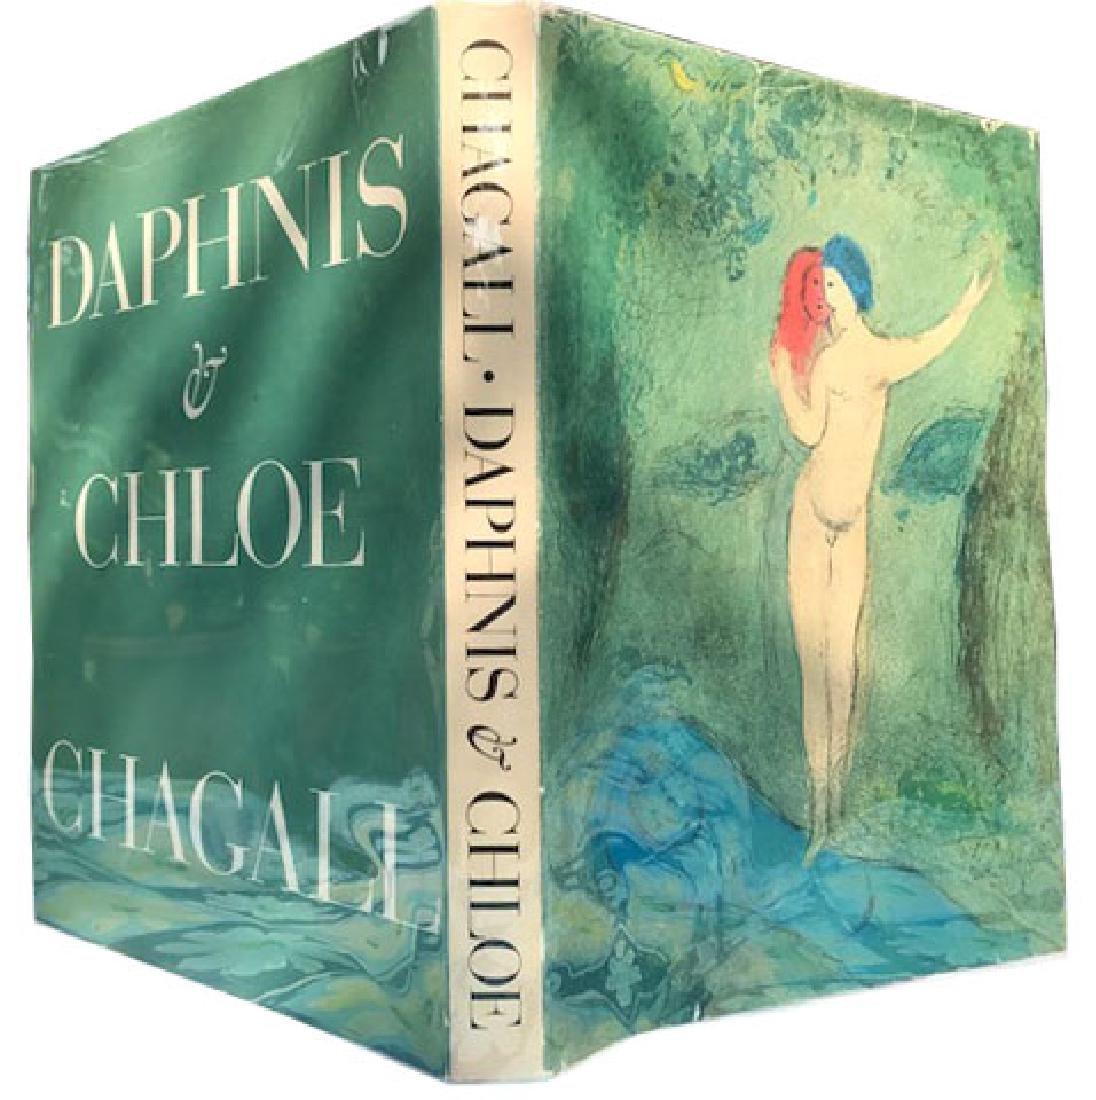 Chagall: Daphnis & Chloe